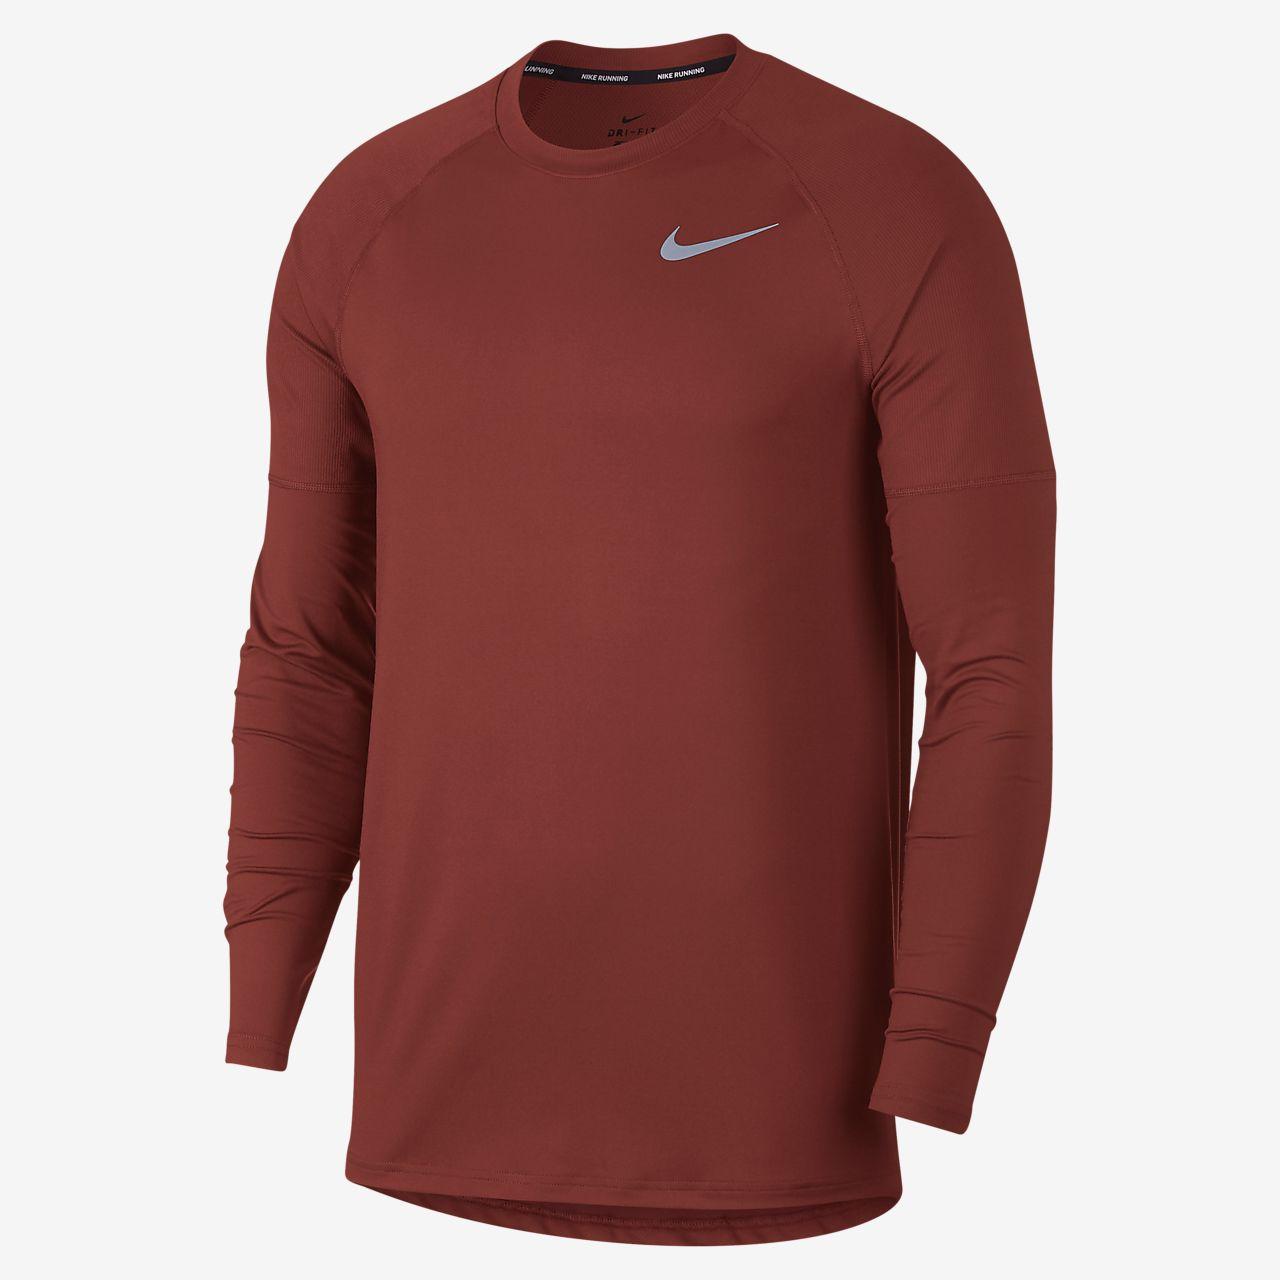 Camisola de running Nike para homem